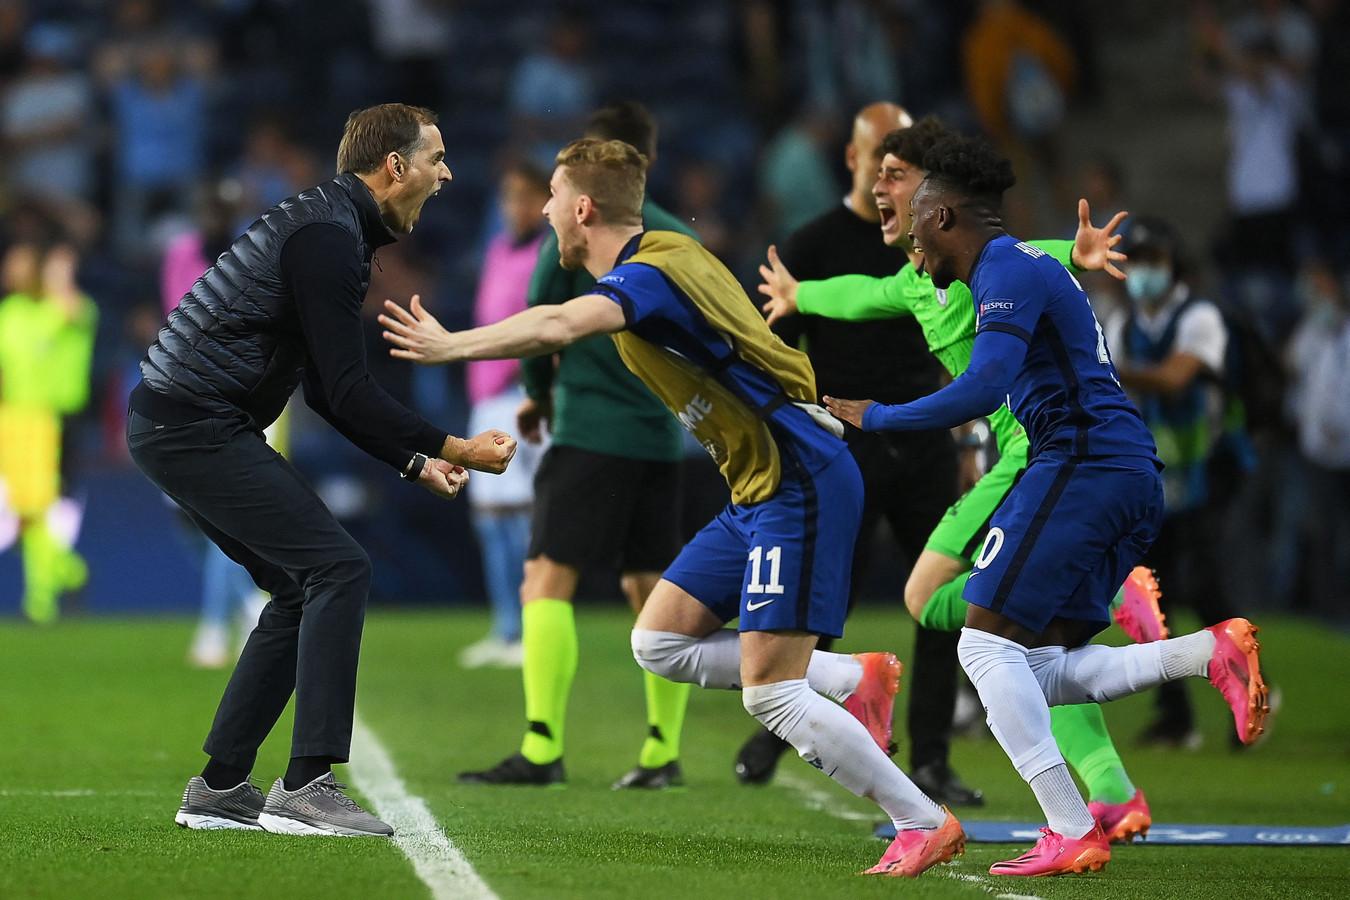 Thomas Tuchel viert feest na het behalen van de Champions League.